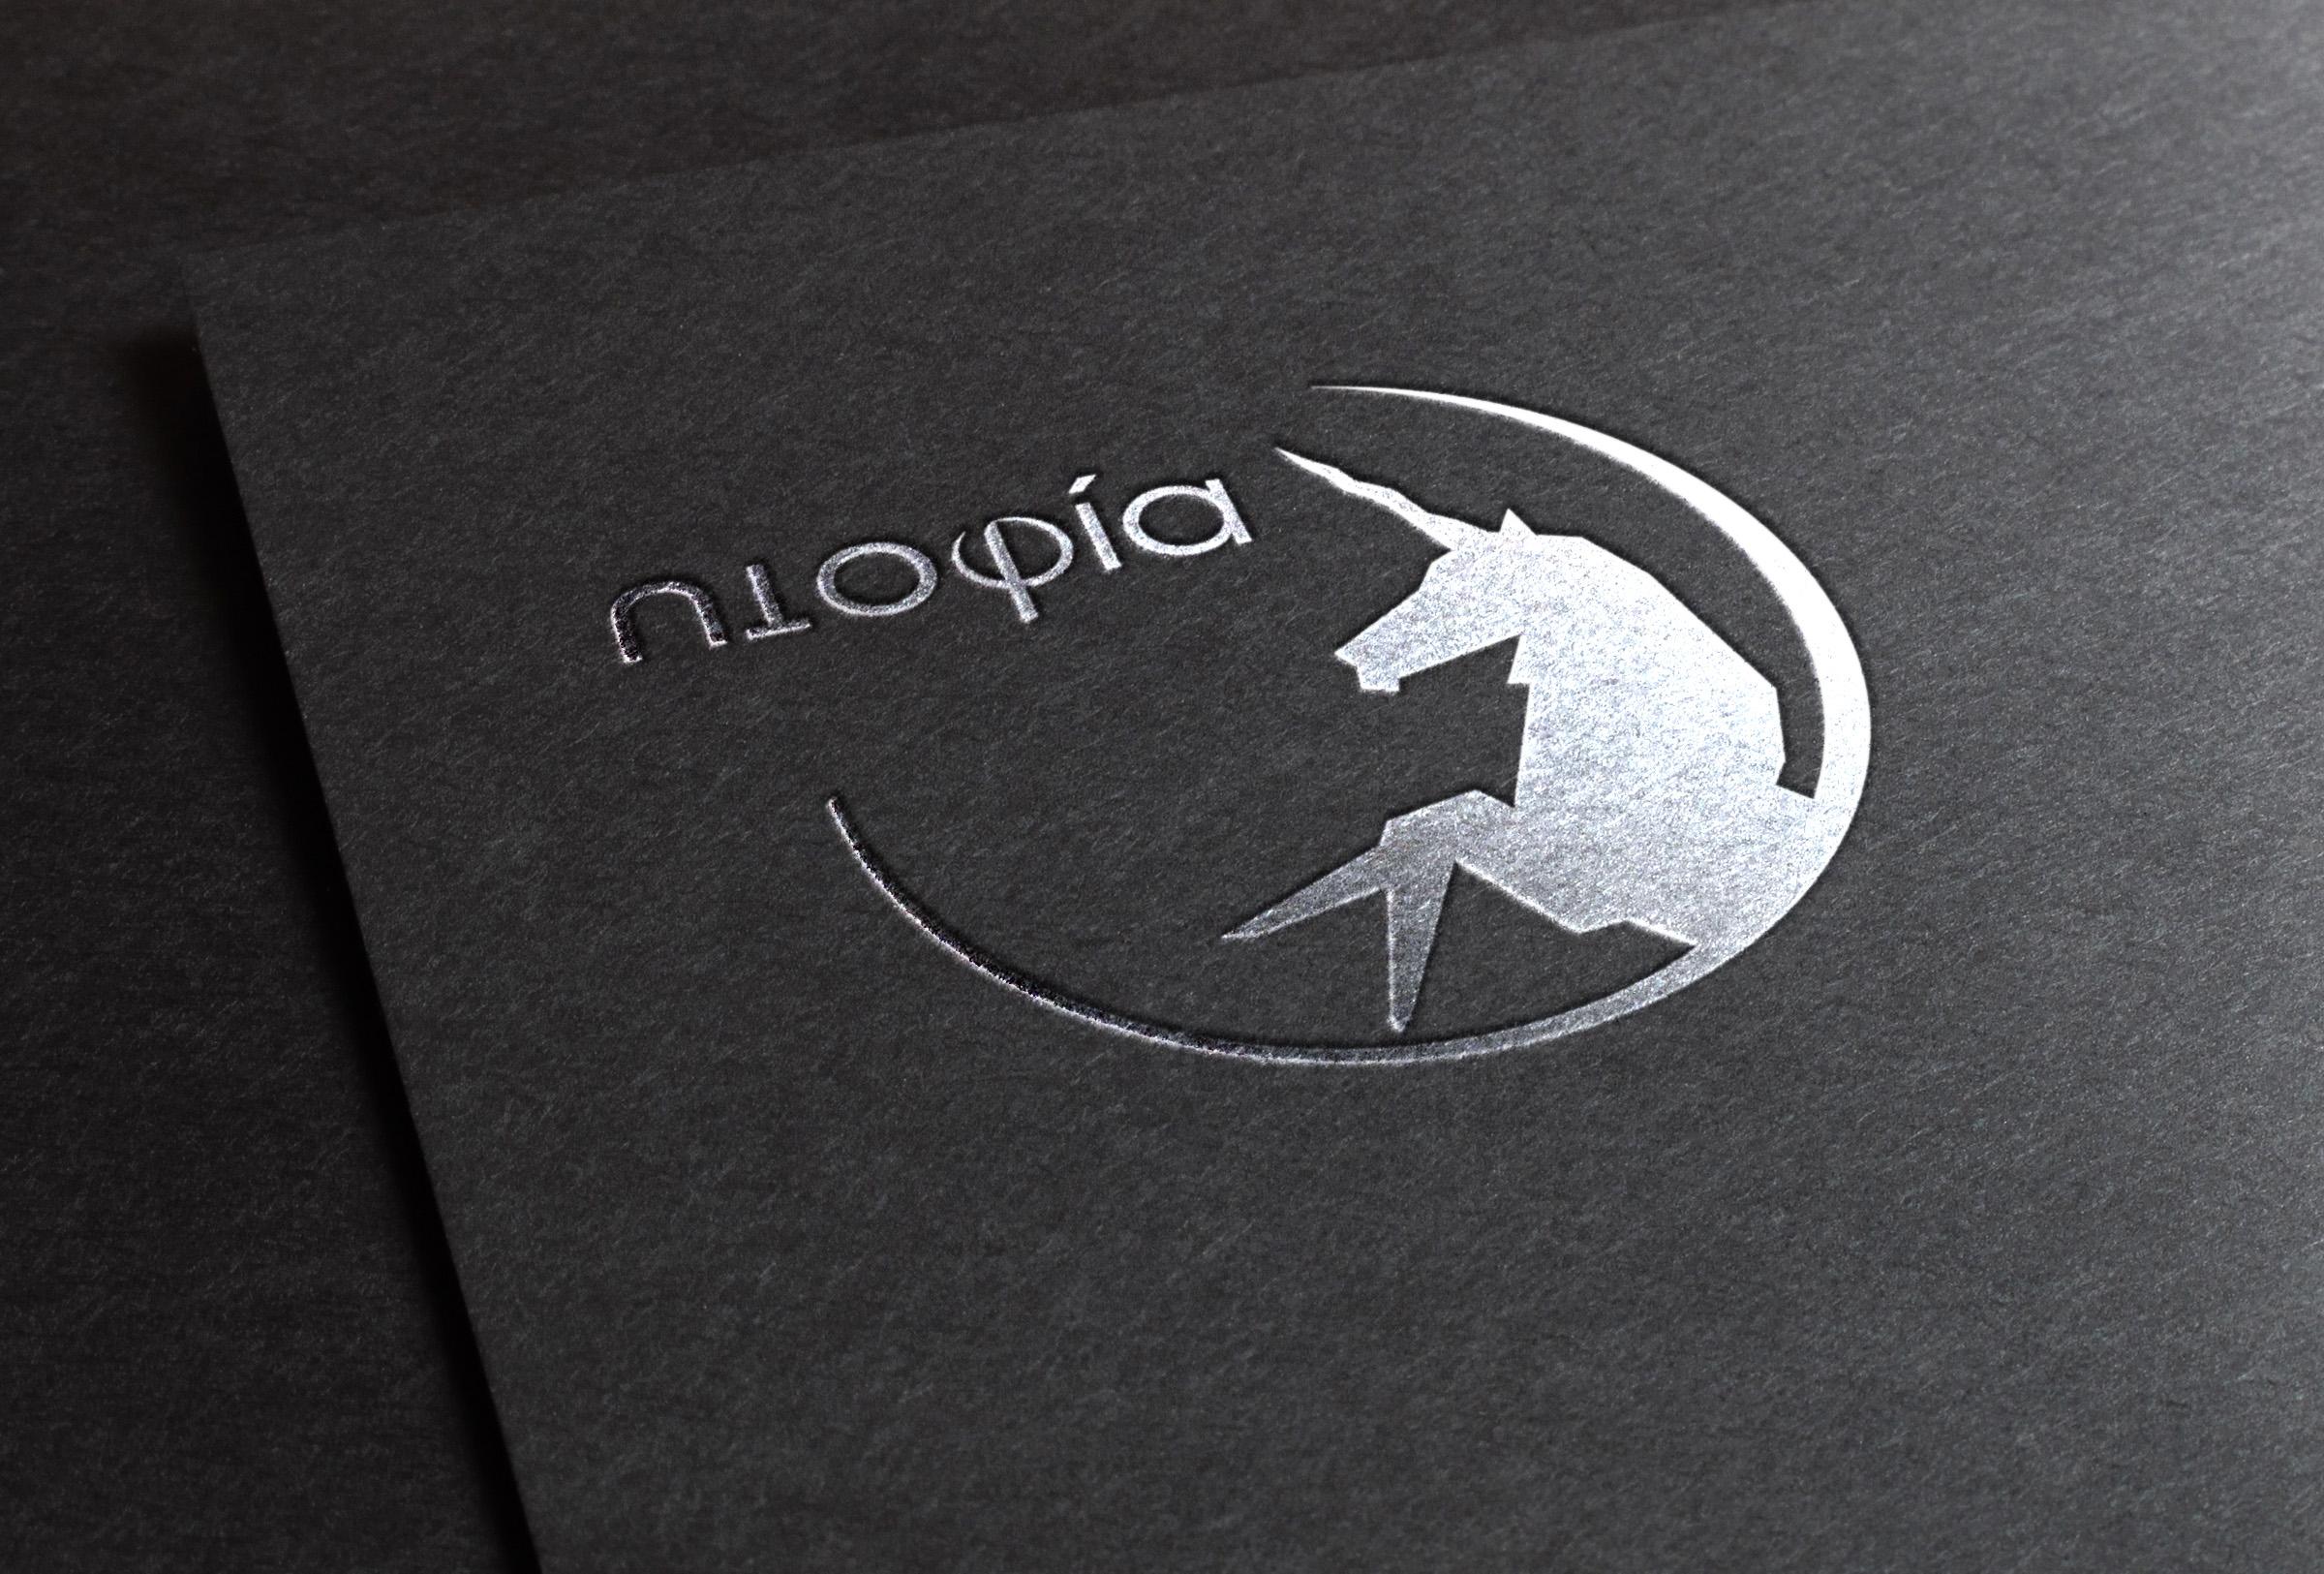 02_Utophia Ed logo design by Pau Vitti